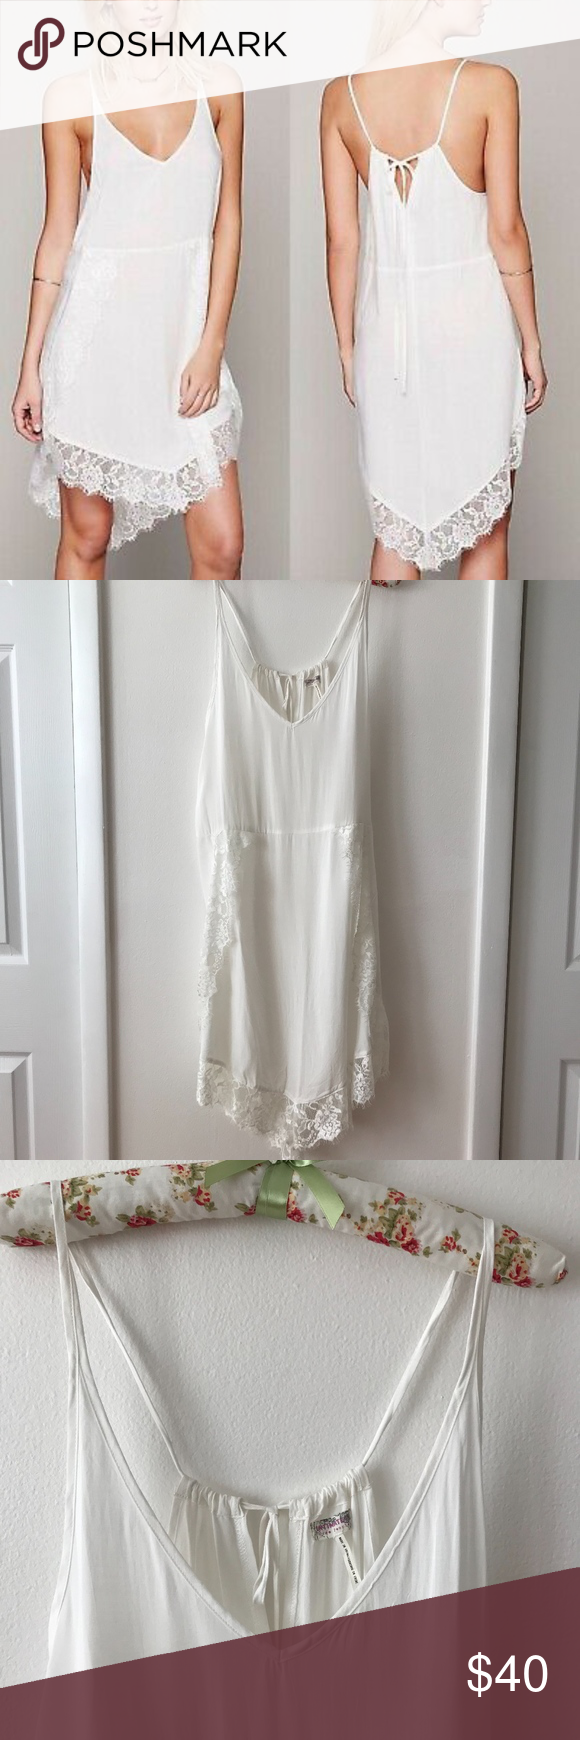 Intimately Free People White Lace Trim Slip Dress Slip Dress White Lace Free People Dress [ 1740 x 580 Pixel ]